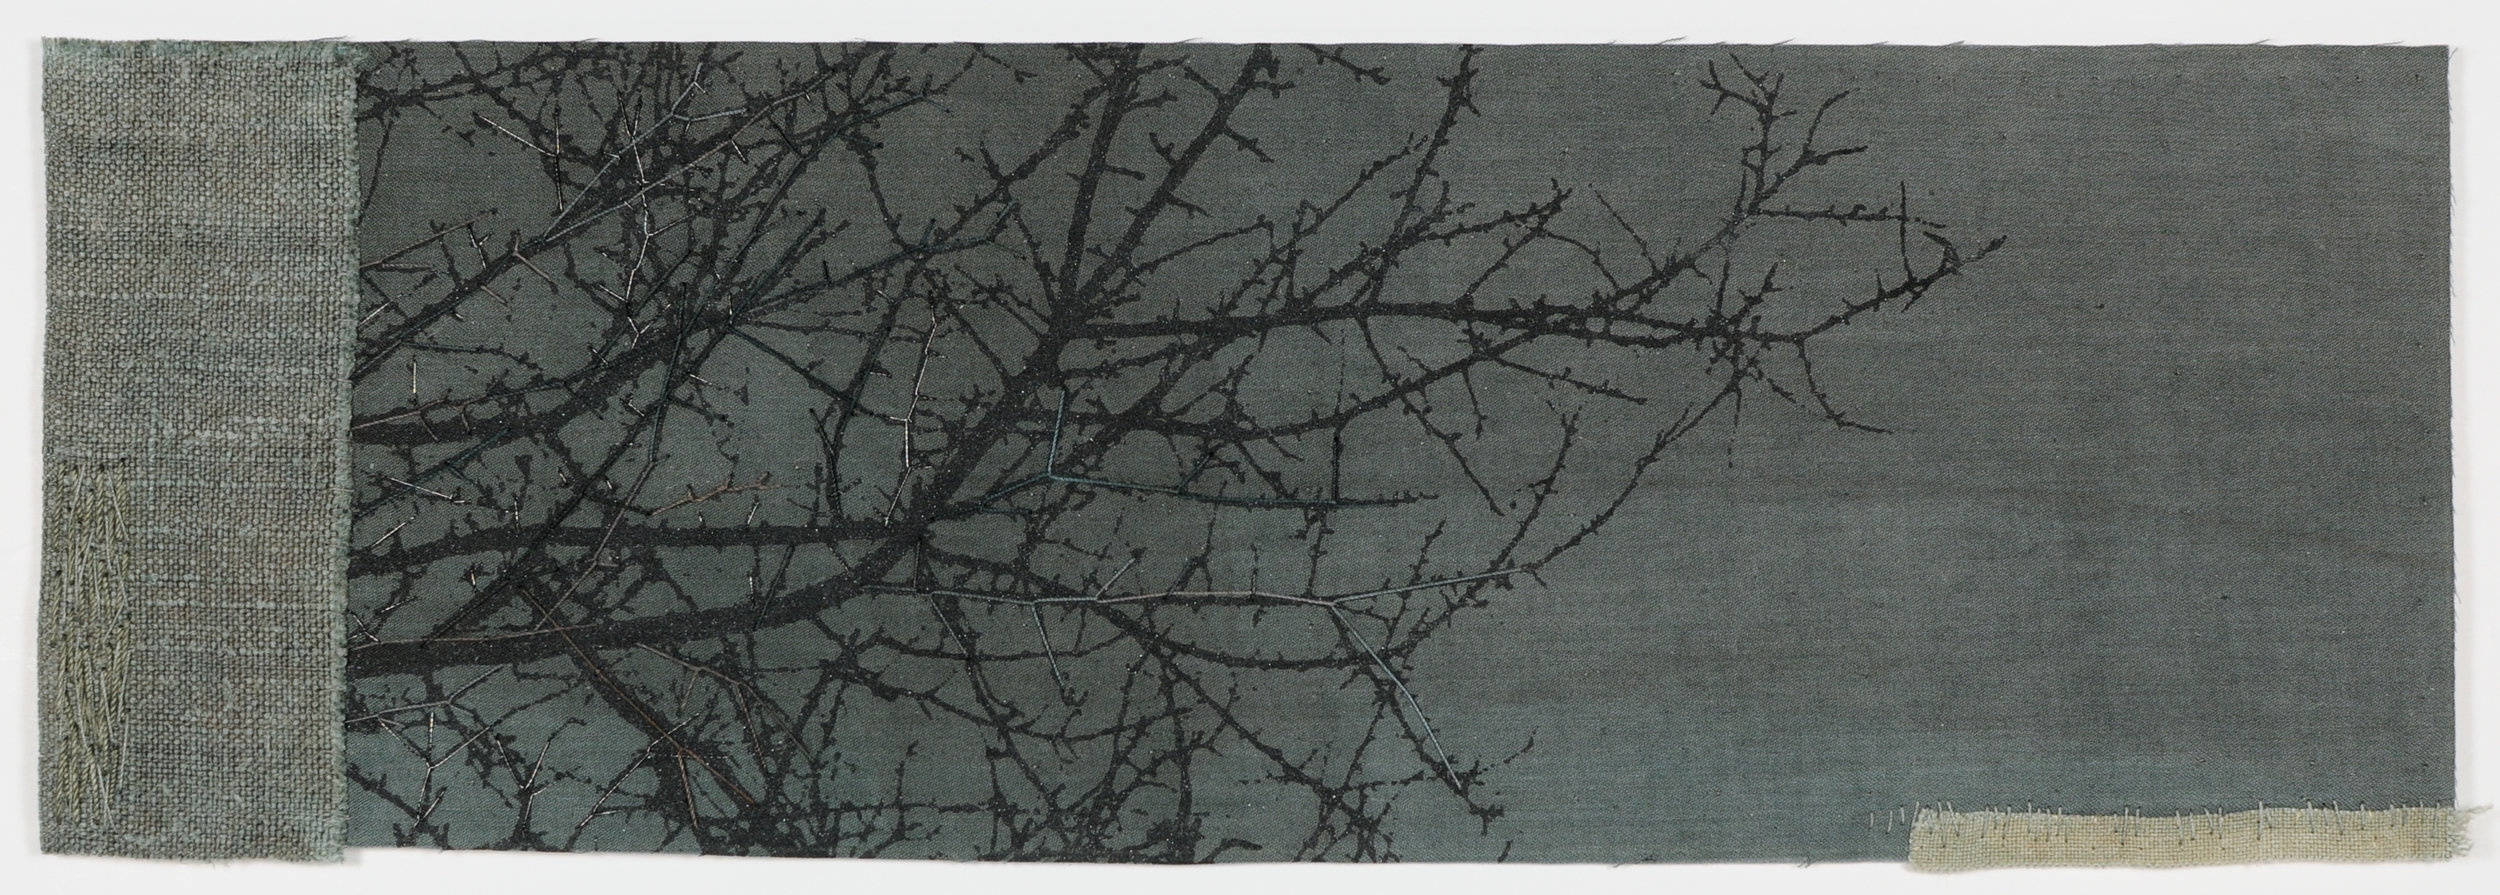 Thorn 06 Noctua.jpg